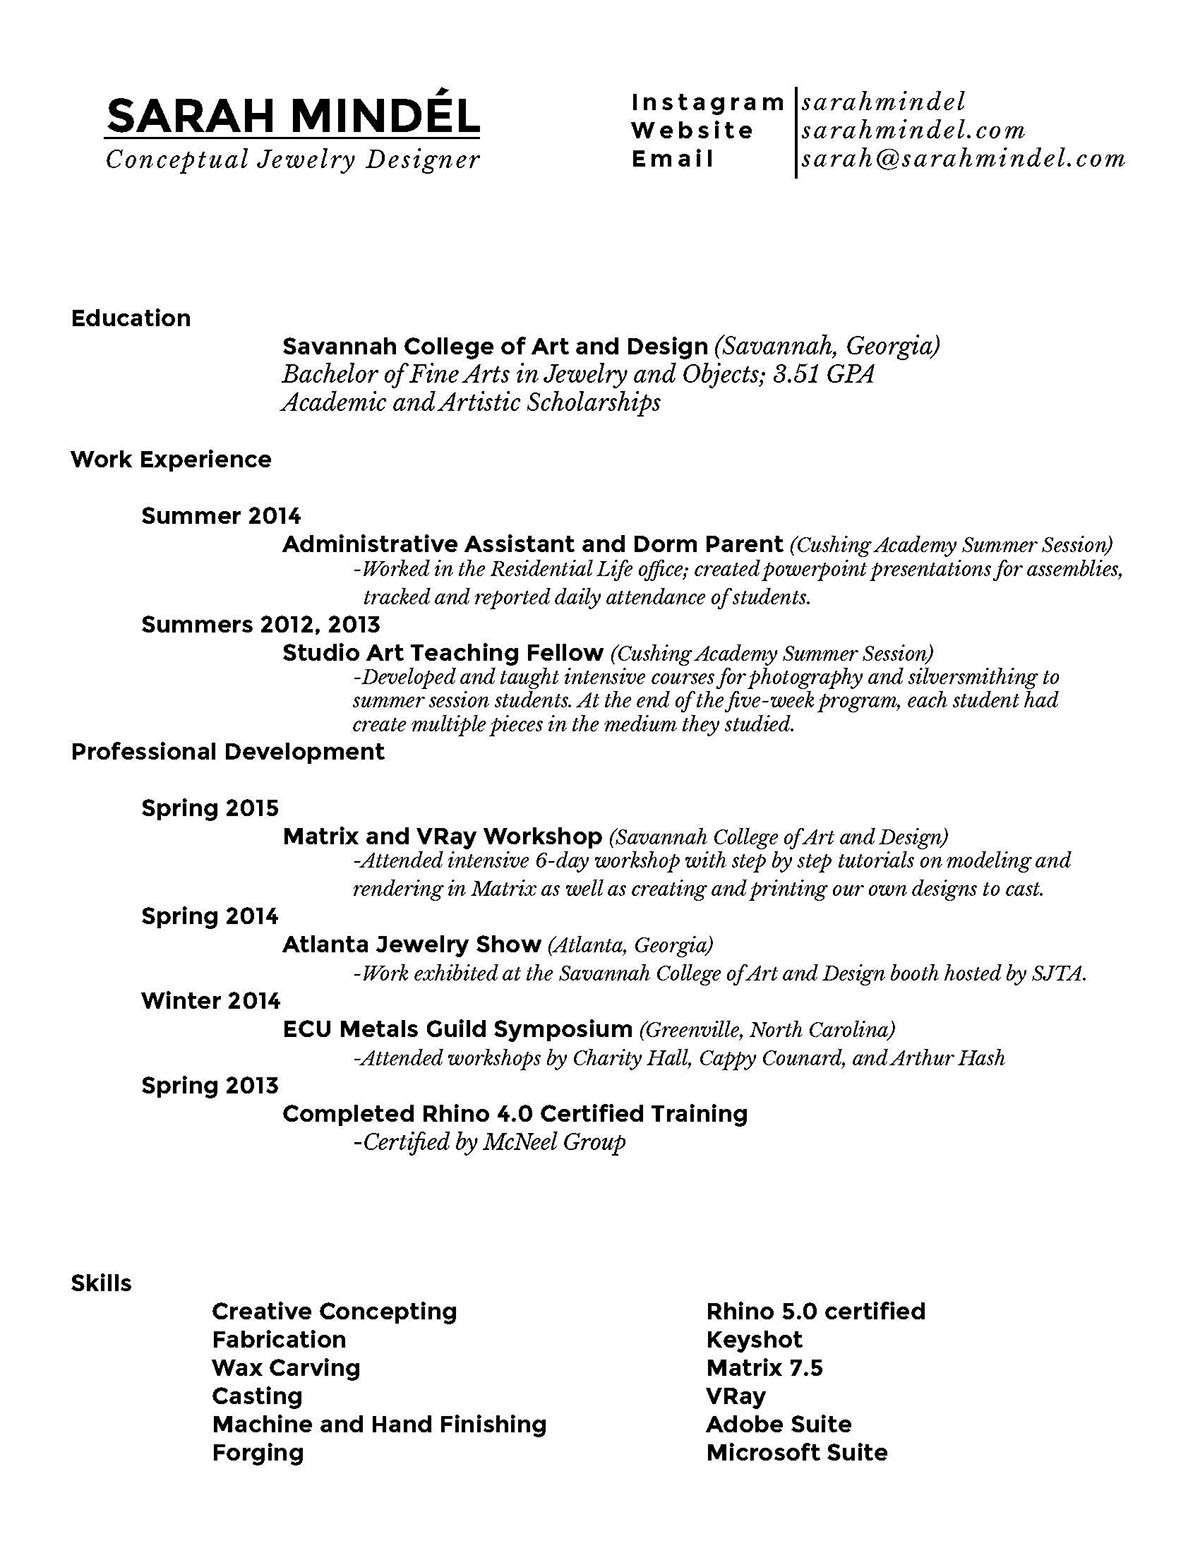 jewelry designer resume - Monza berglauf-verband com